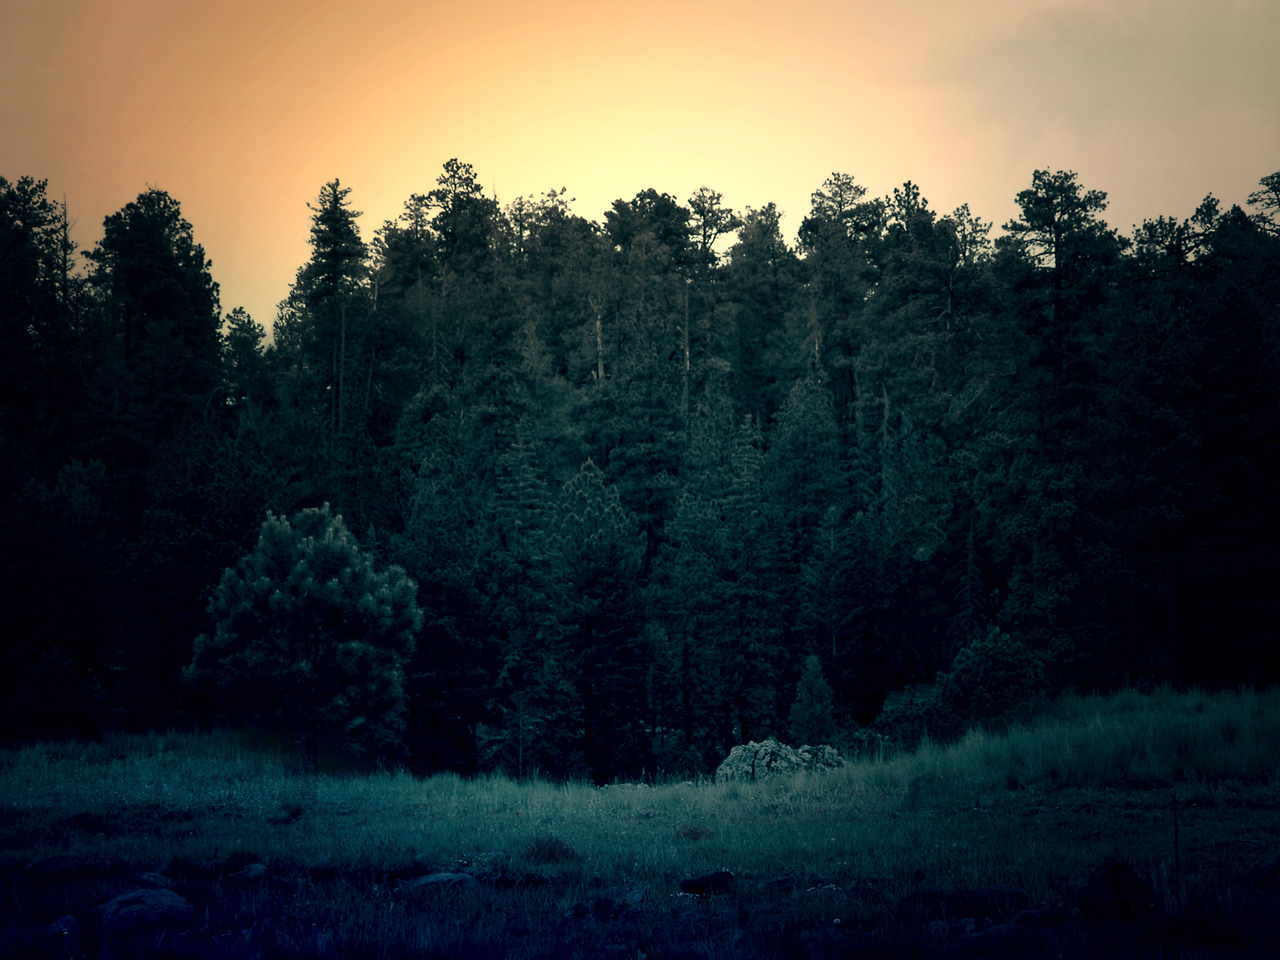 Forest by Julie Geiger